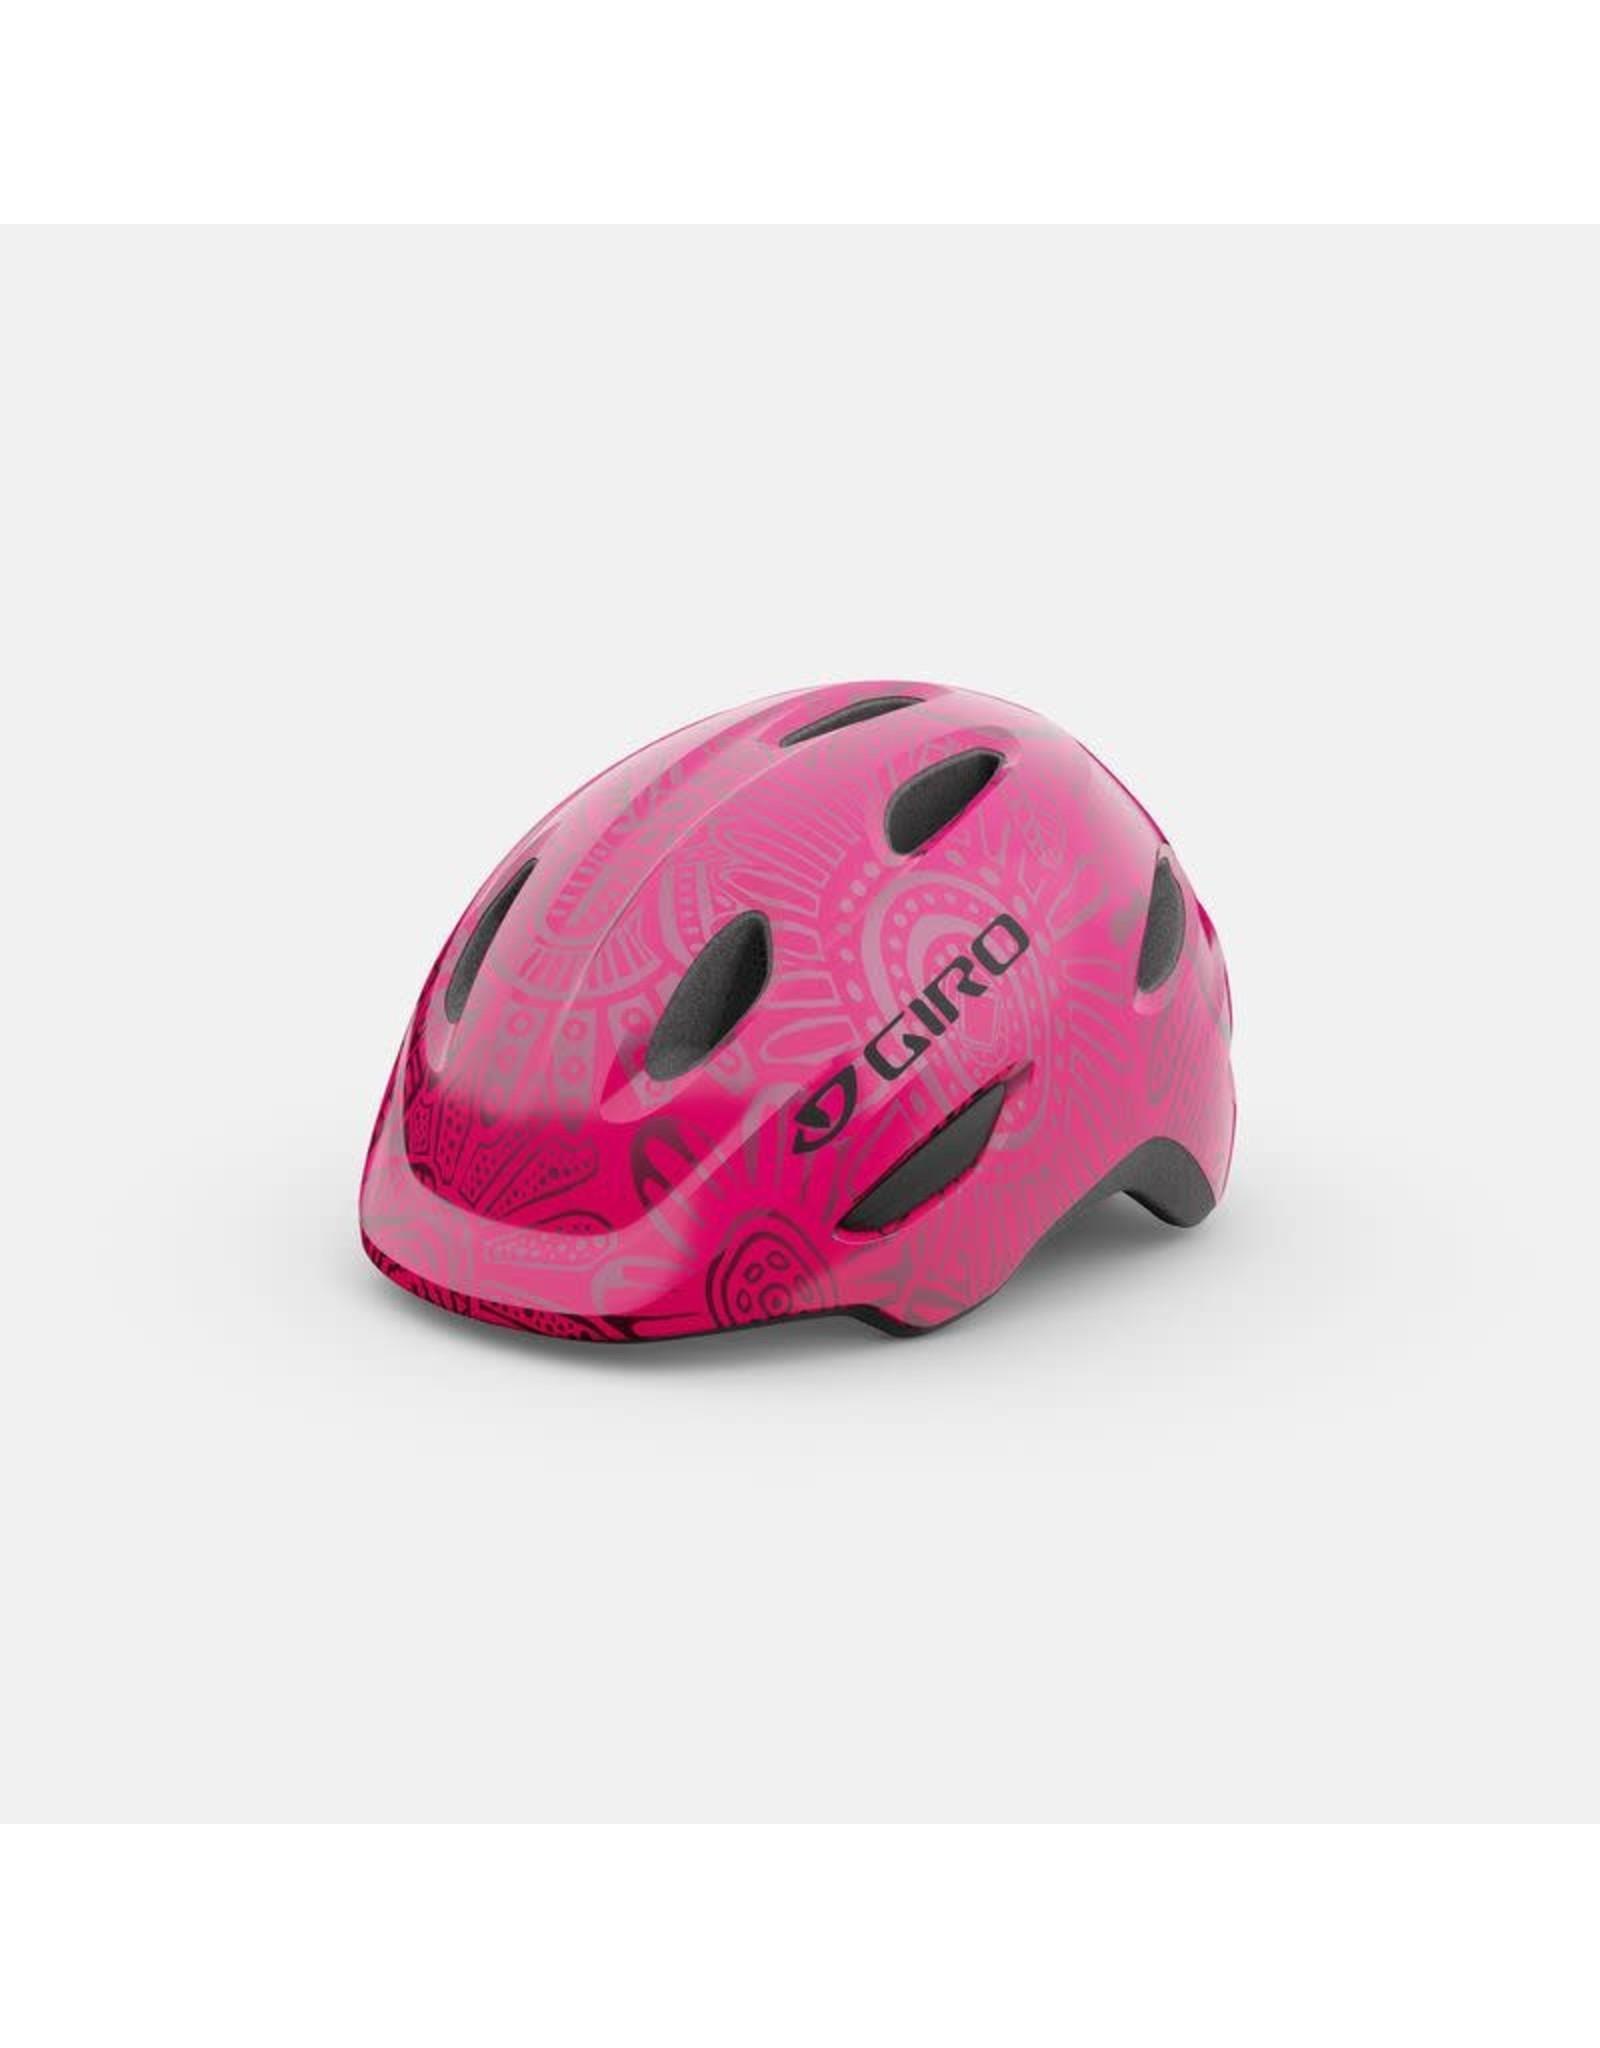 Giro Bike GIRO SCAMP BRT PNKPEARL S